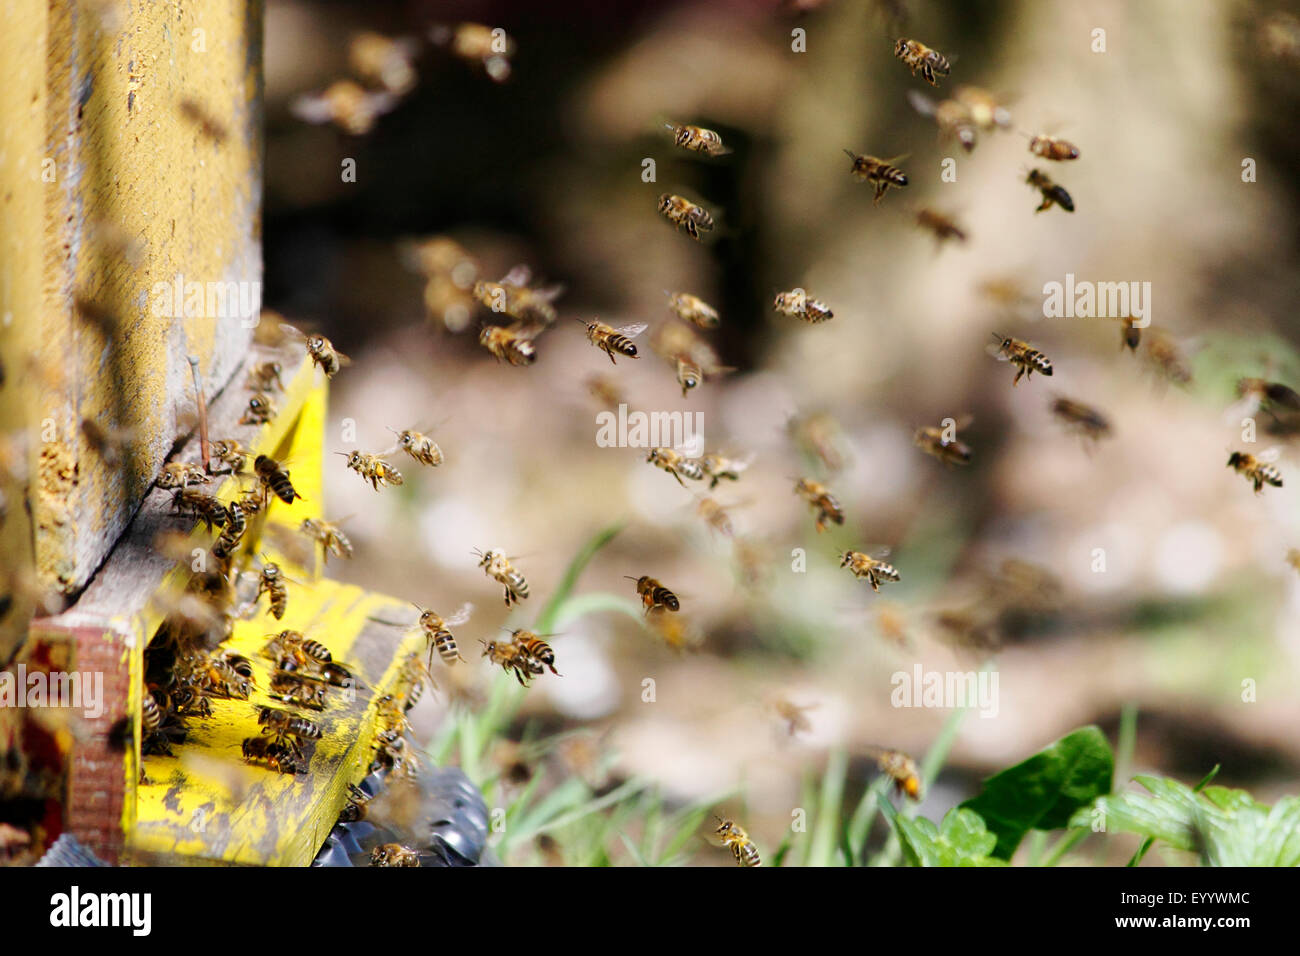 Miel de abeja, colmena de abejas (Apis mellifera mellifera), las abejas volando alrededor del cuadro, Alemania Imagen De Stock